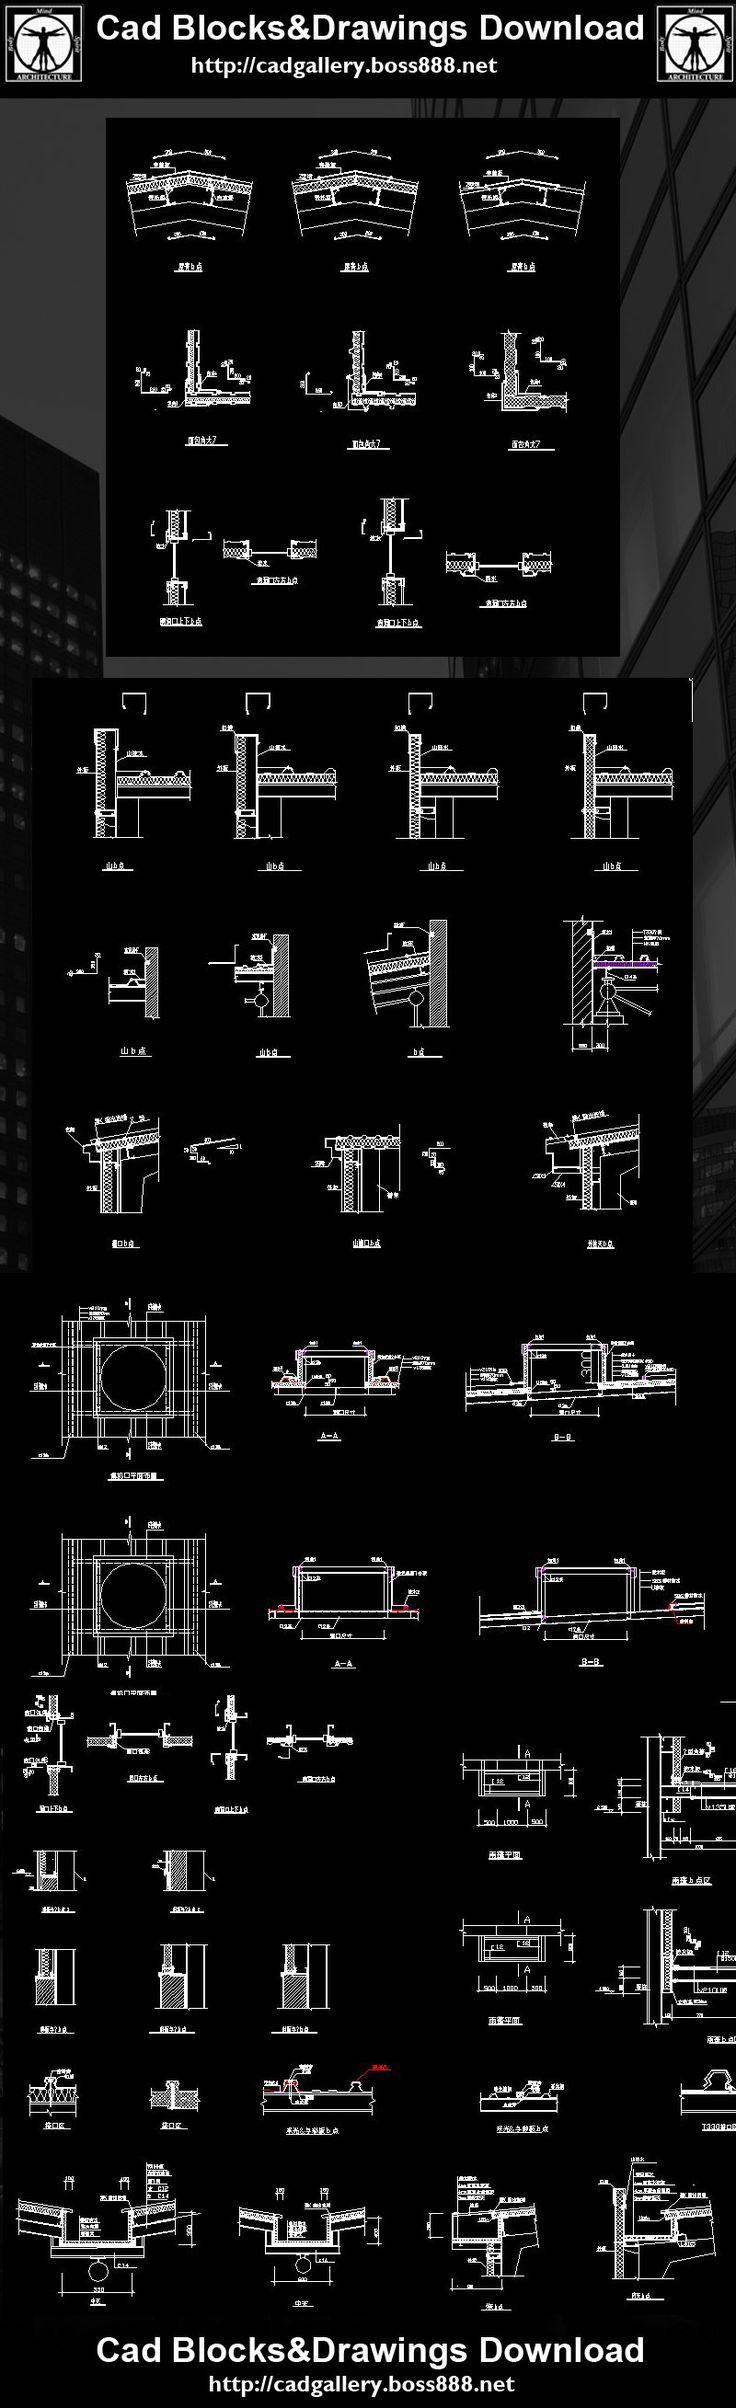 1217 Best Autocad Details Images On Pinterest Cad Blocks Cad